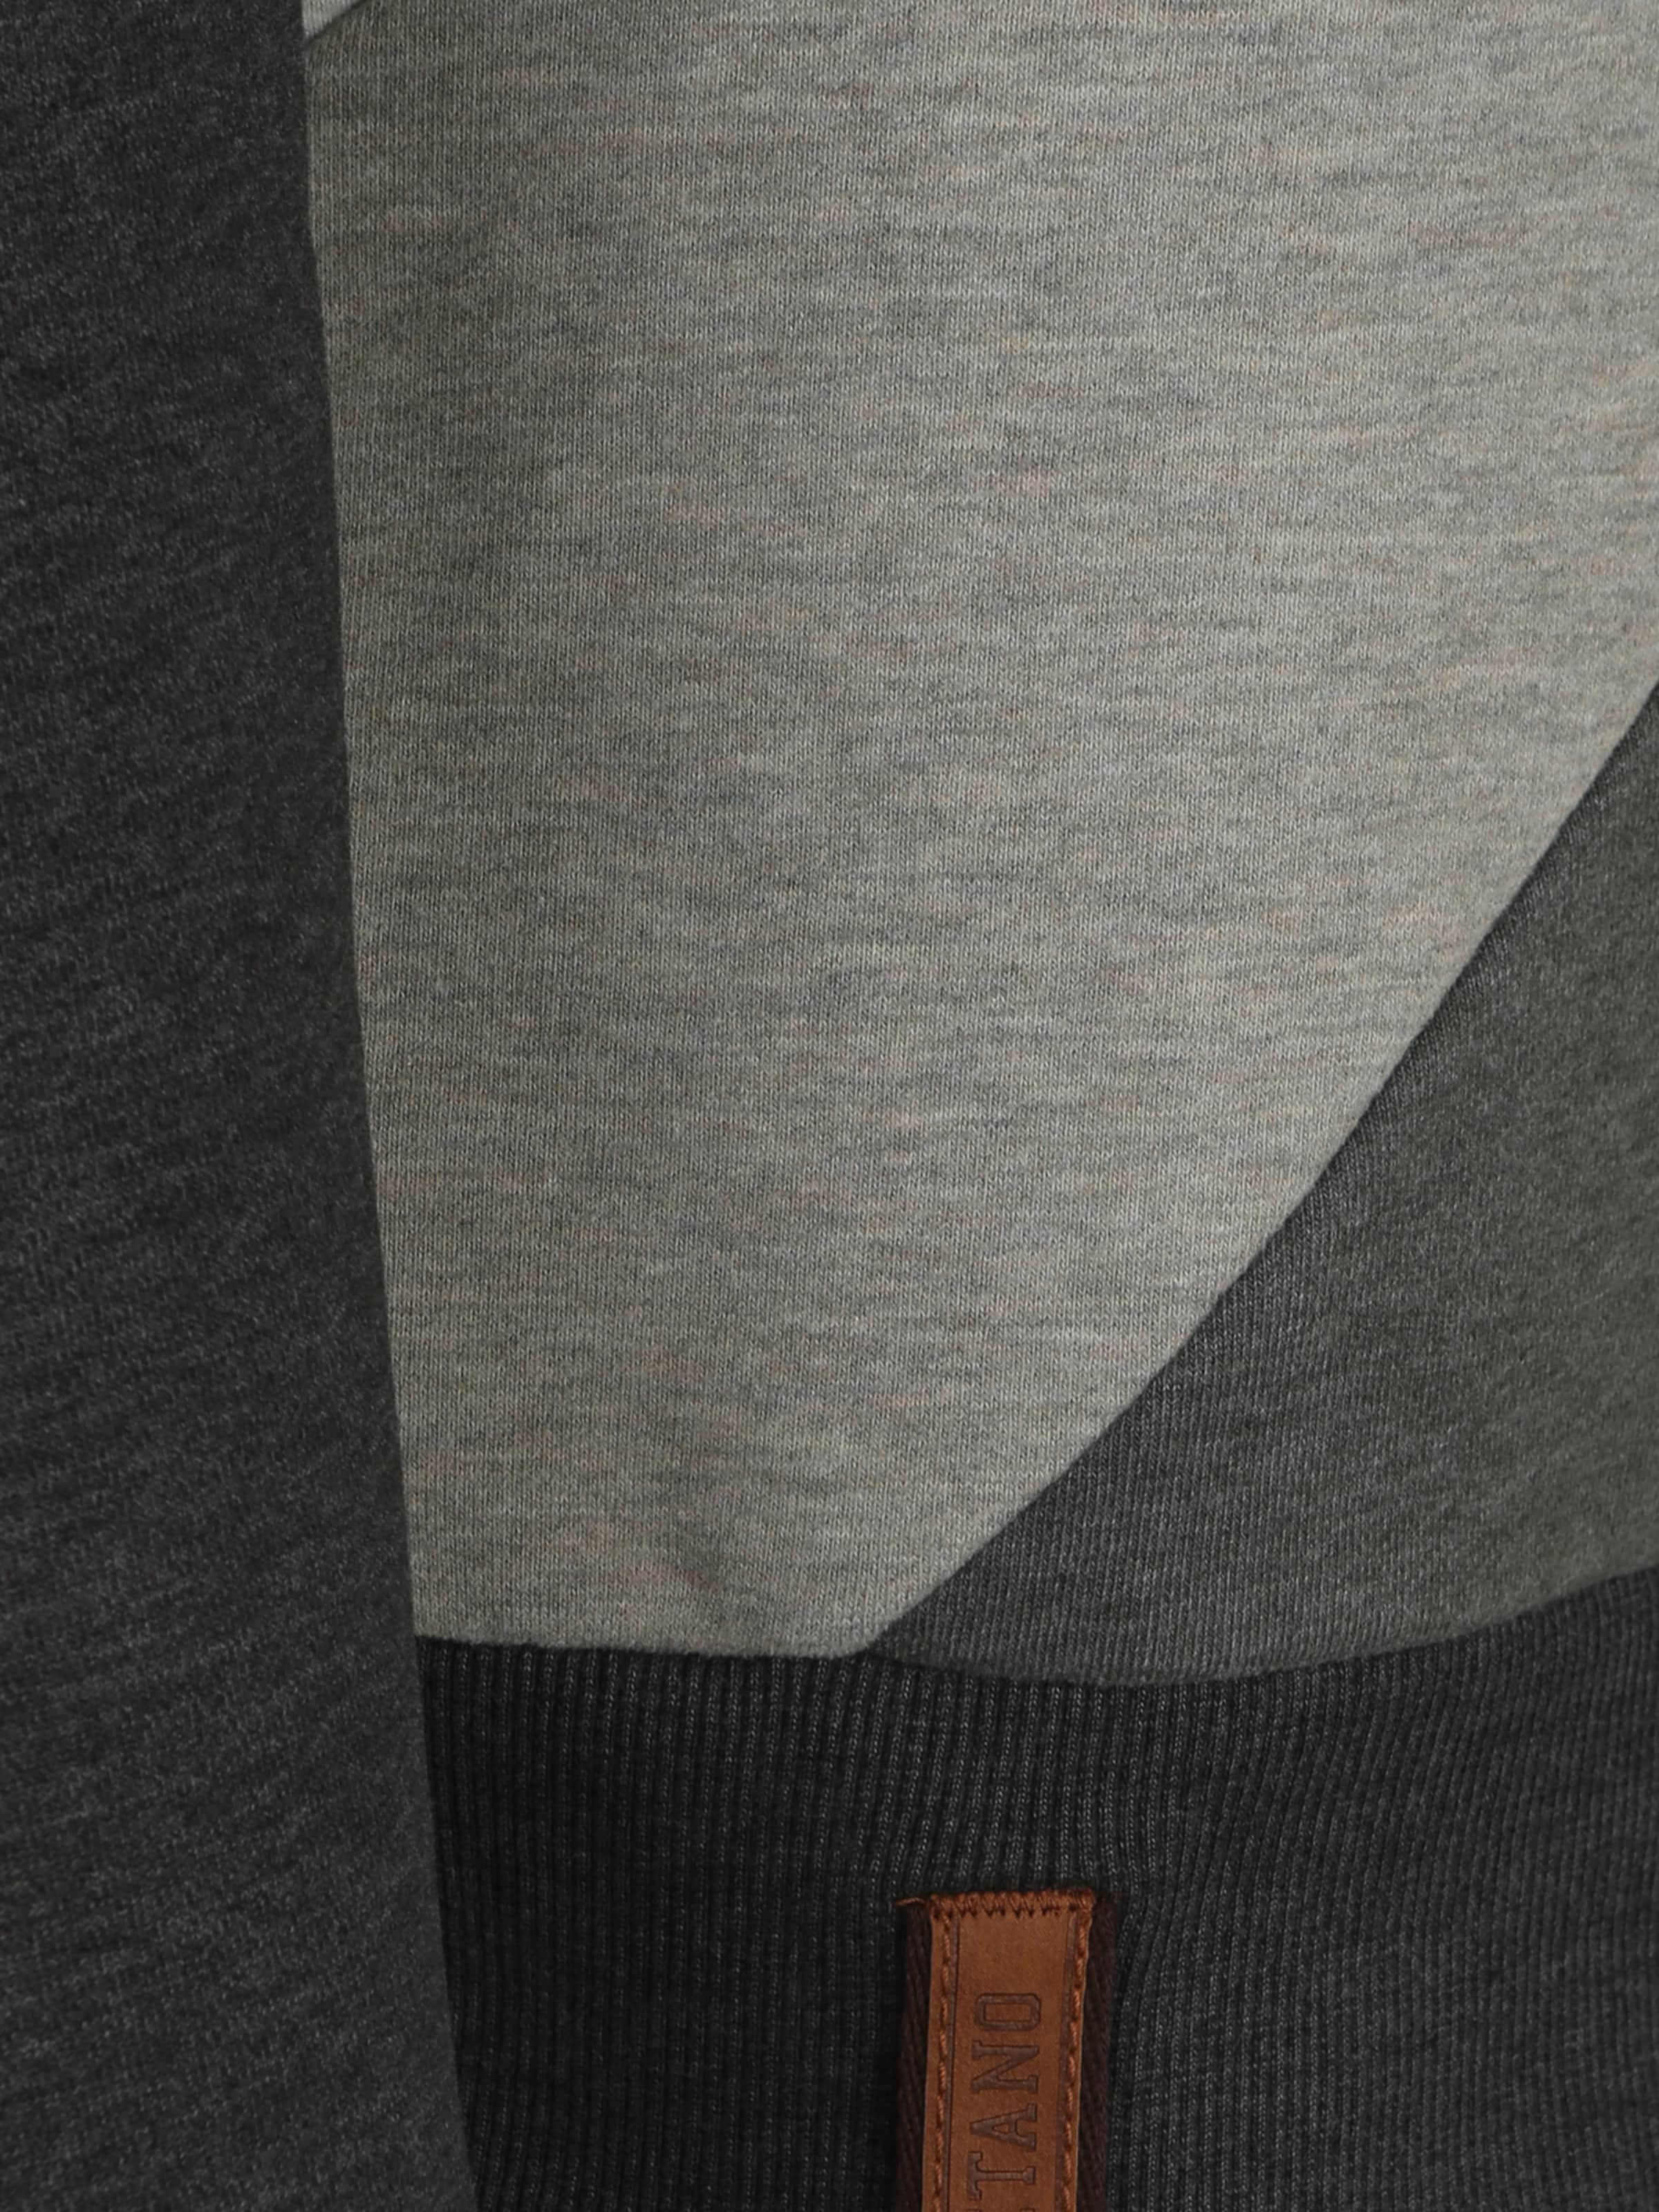 Sweat En shirt Bleu Foncé Naketano SMGLzVqUp